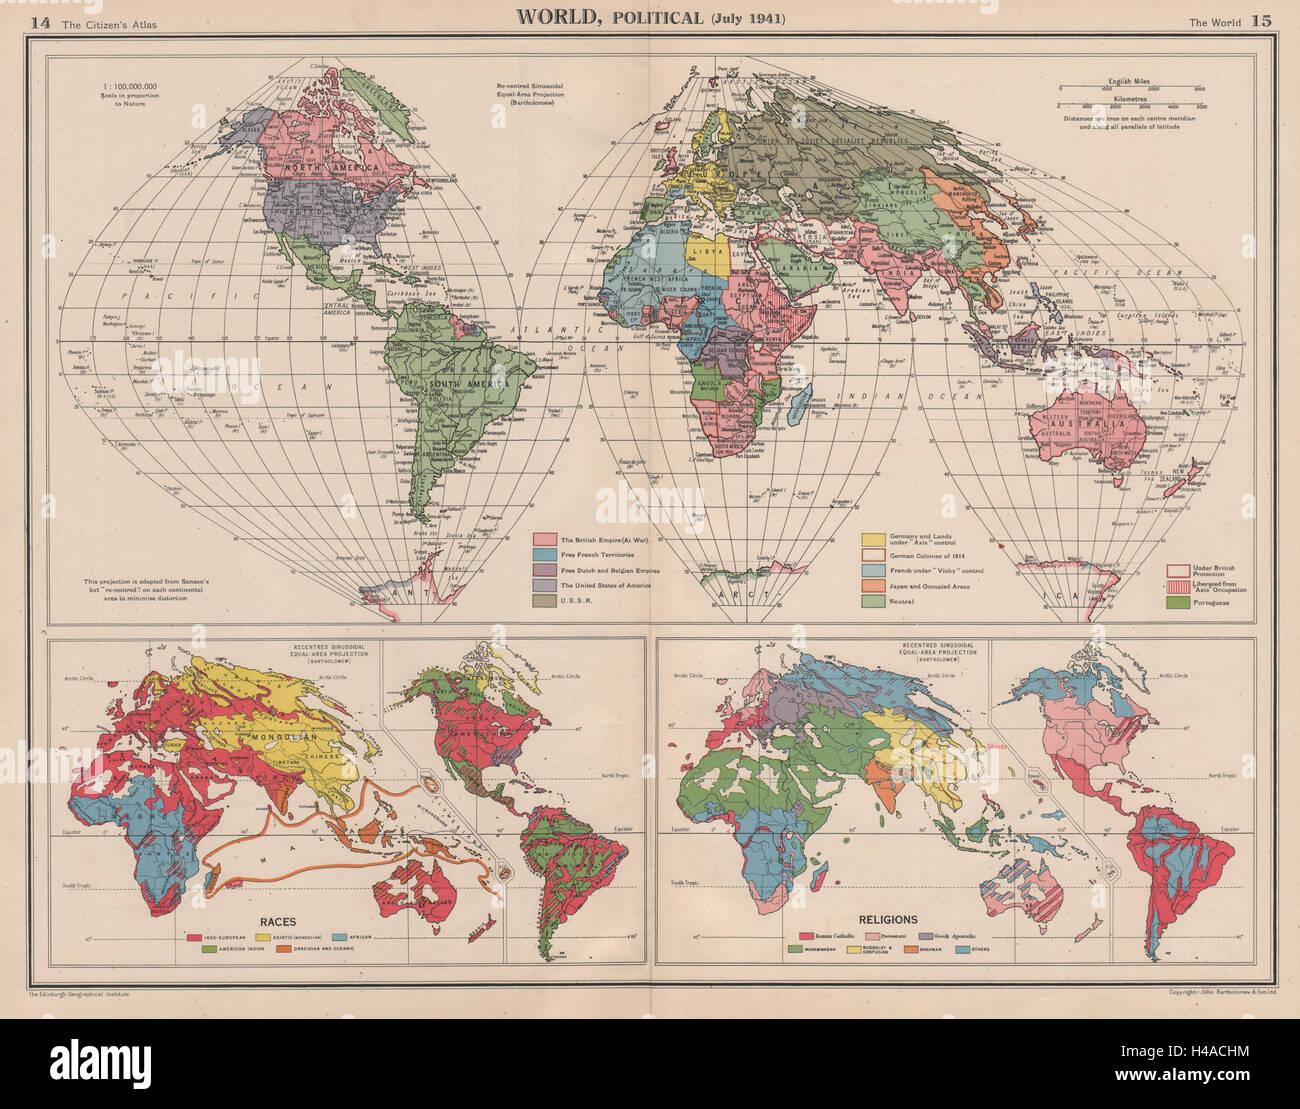 World in 1941 third reich japanese occupied china vichy france world in 1941 third reich japanese occupied china vichy france 1944 old map gumiabroncs Images